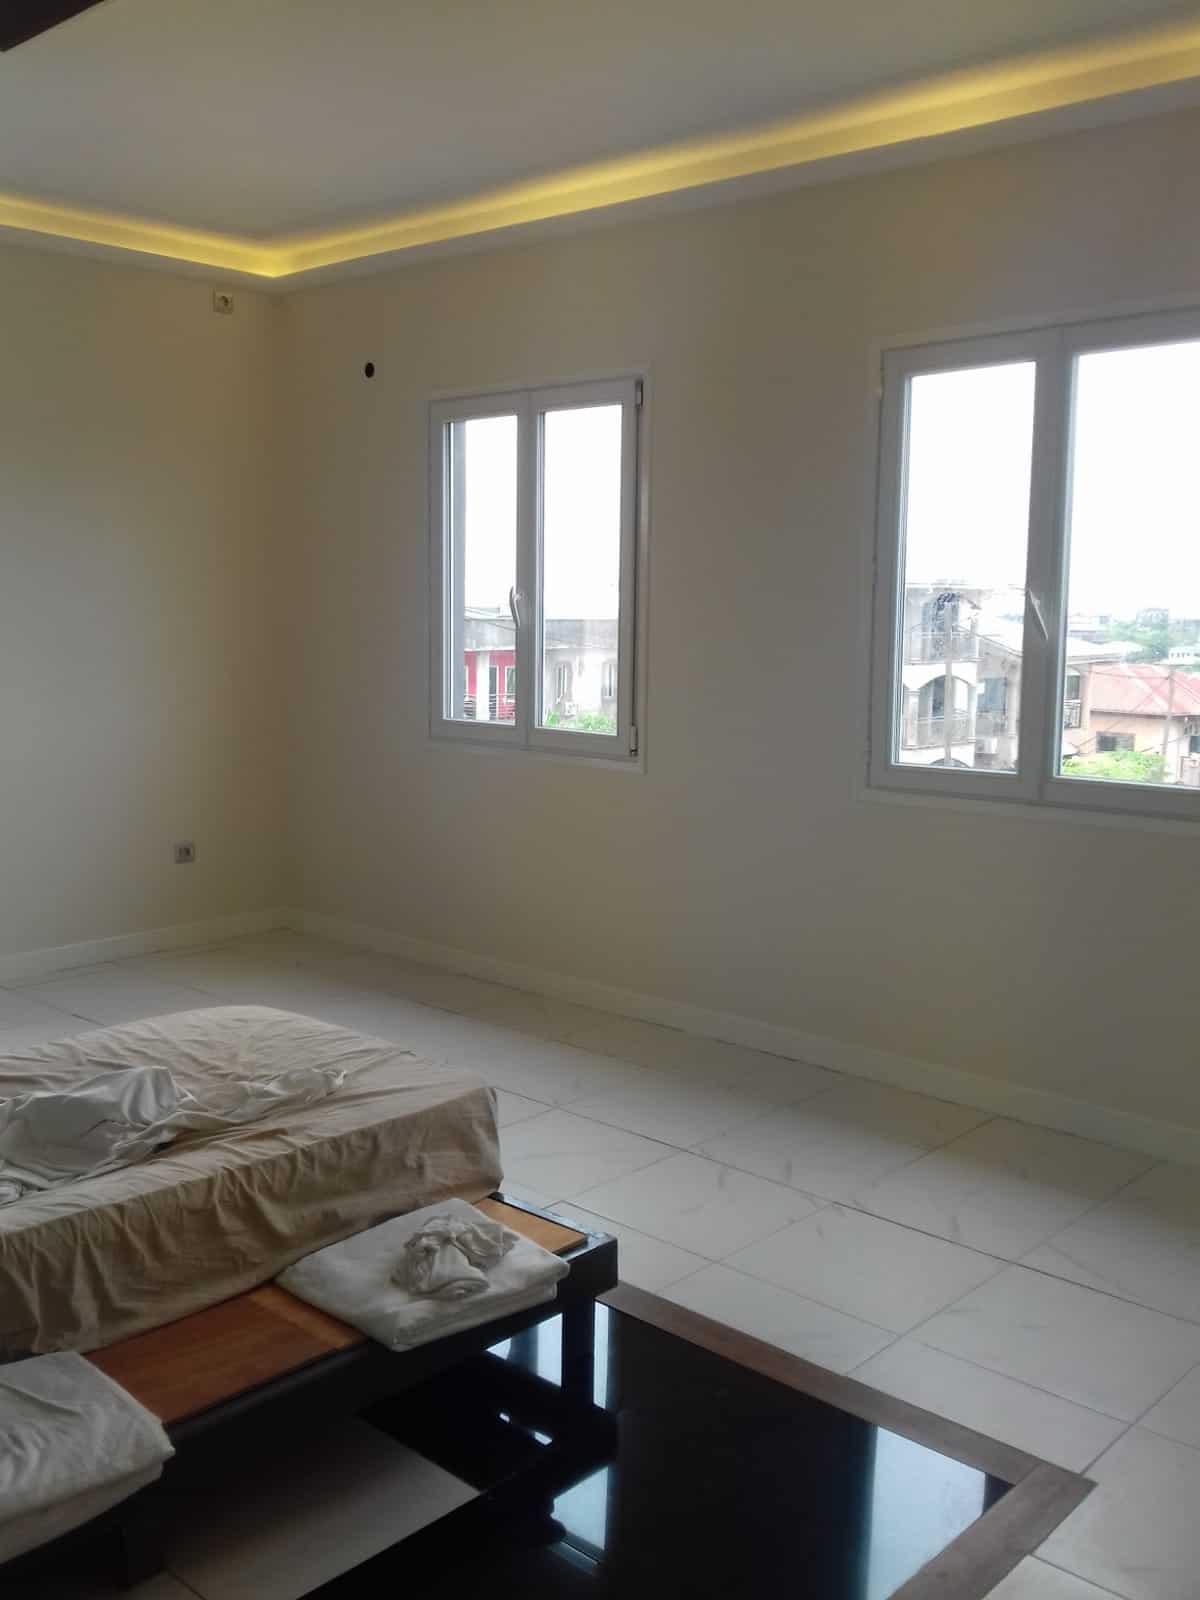 House (Duplex) for sale - Douala, Yassa, Ver pariso - 2 living room(s), 4 bedroom(s), 4 bathroom(s) - 150 000 000 FCFA / month